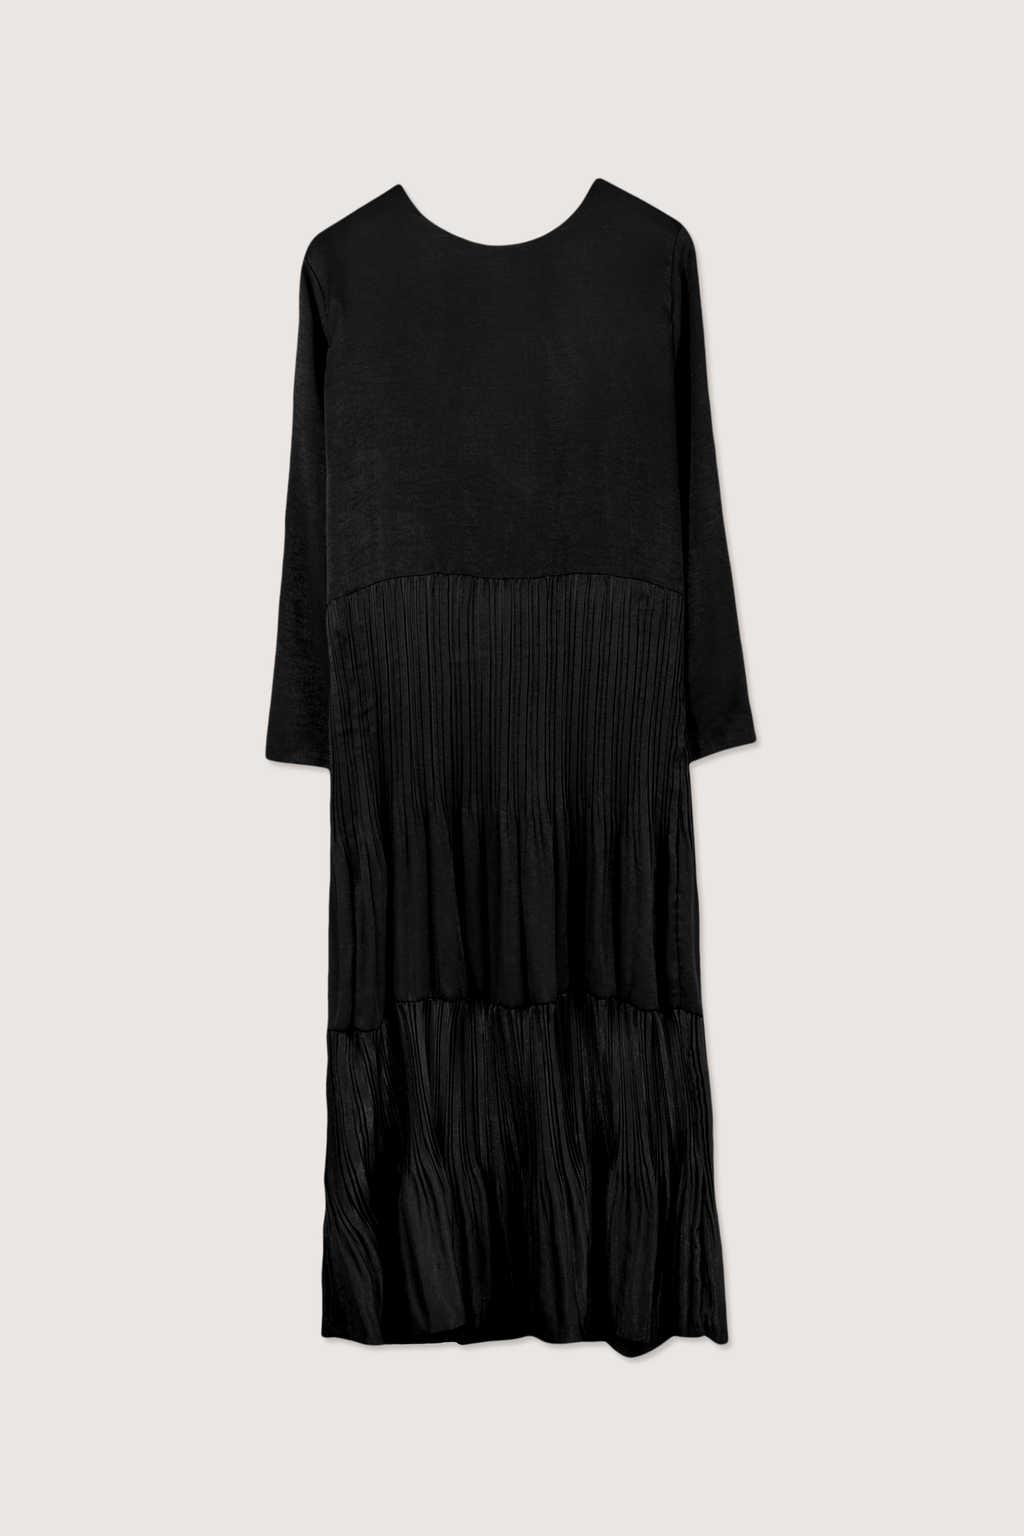 Dress H345 Black 16